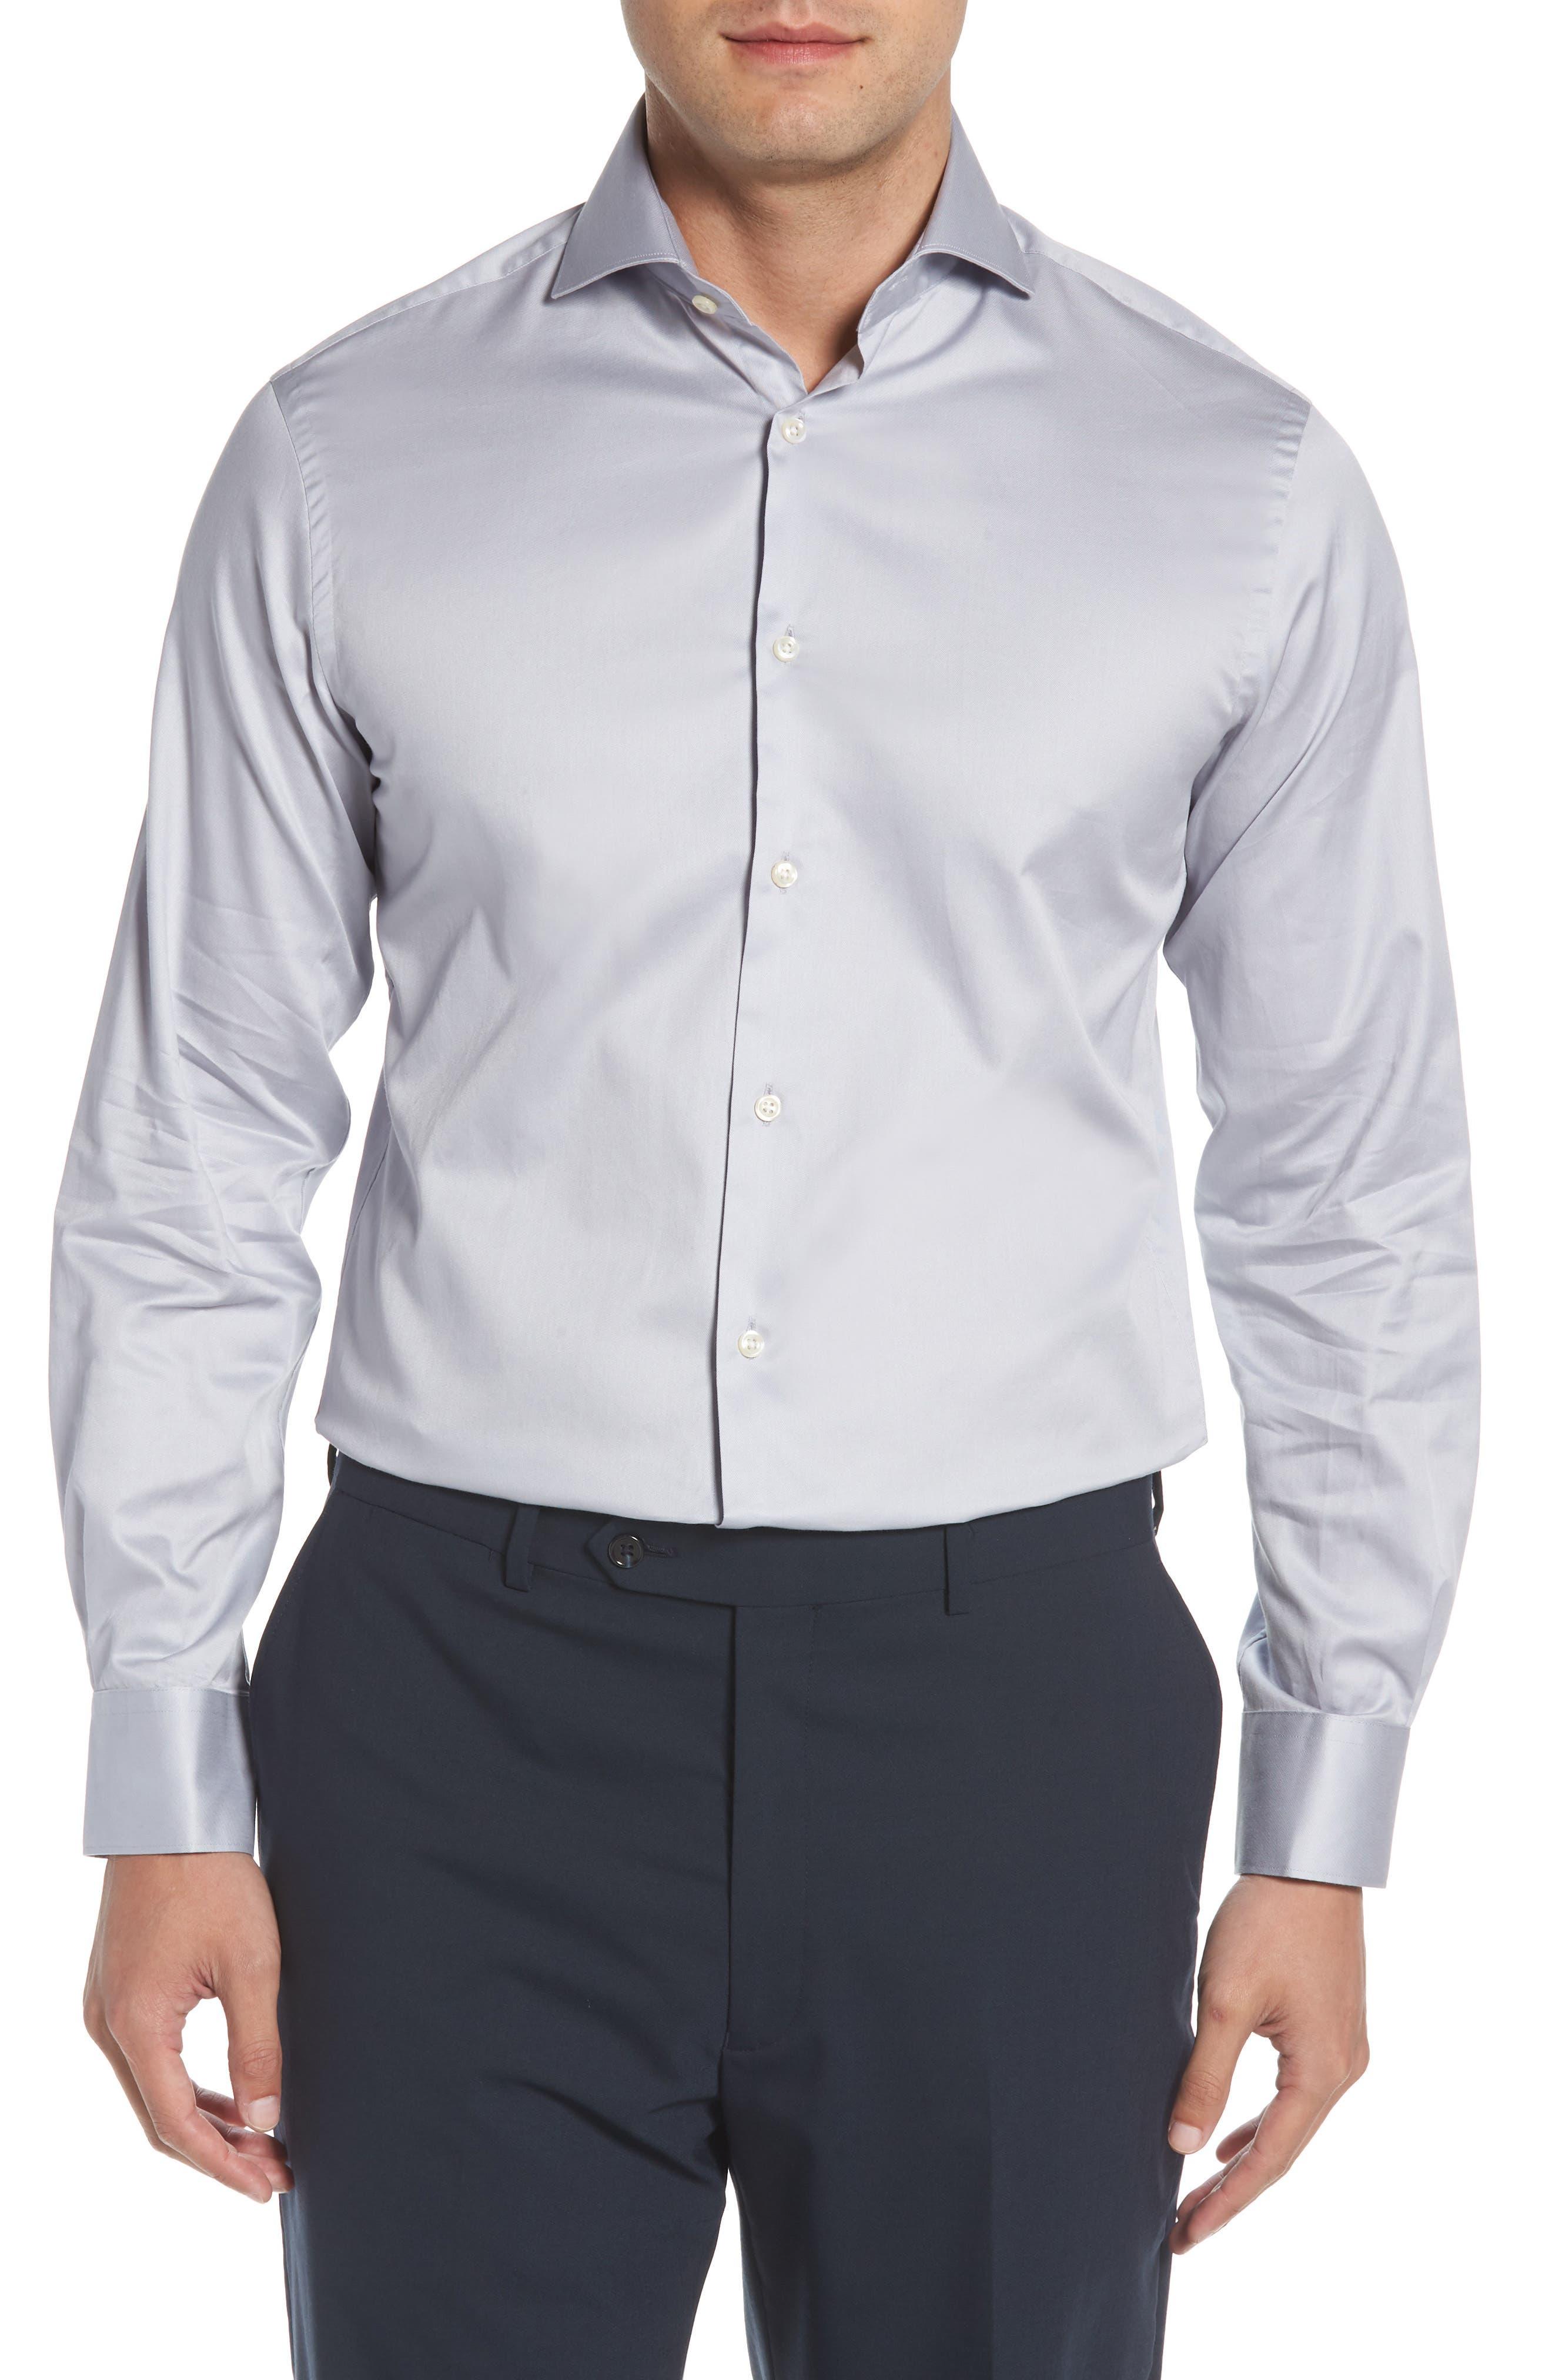 Regular Fit Solid Dress Shirt,                         Main,                         color, 020